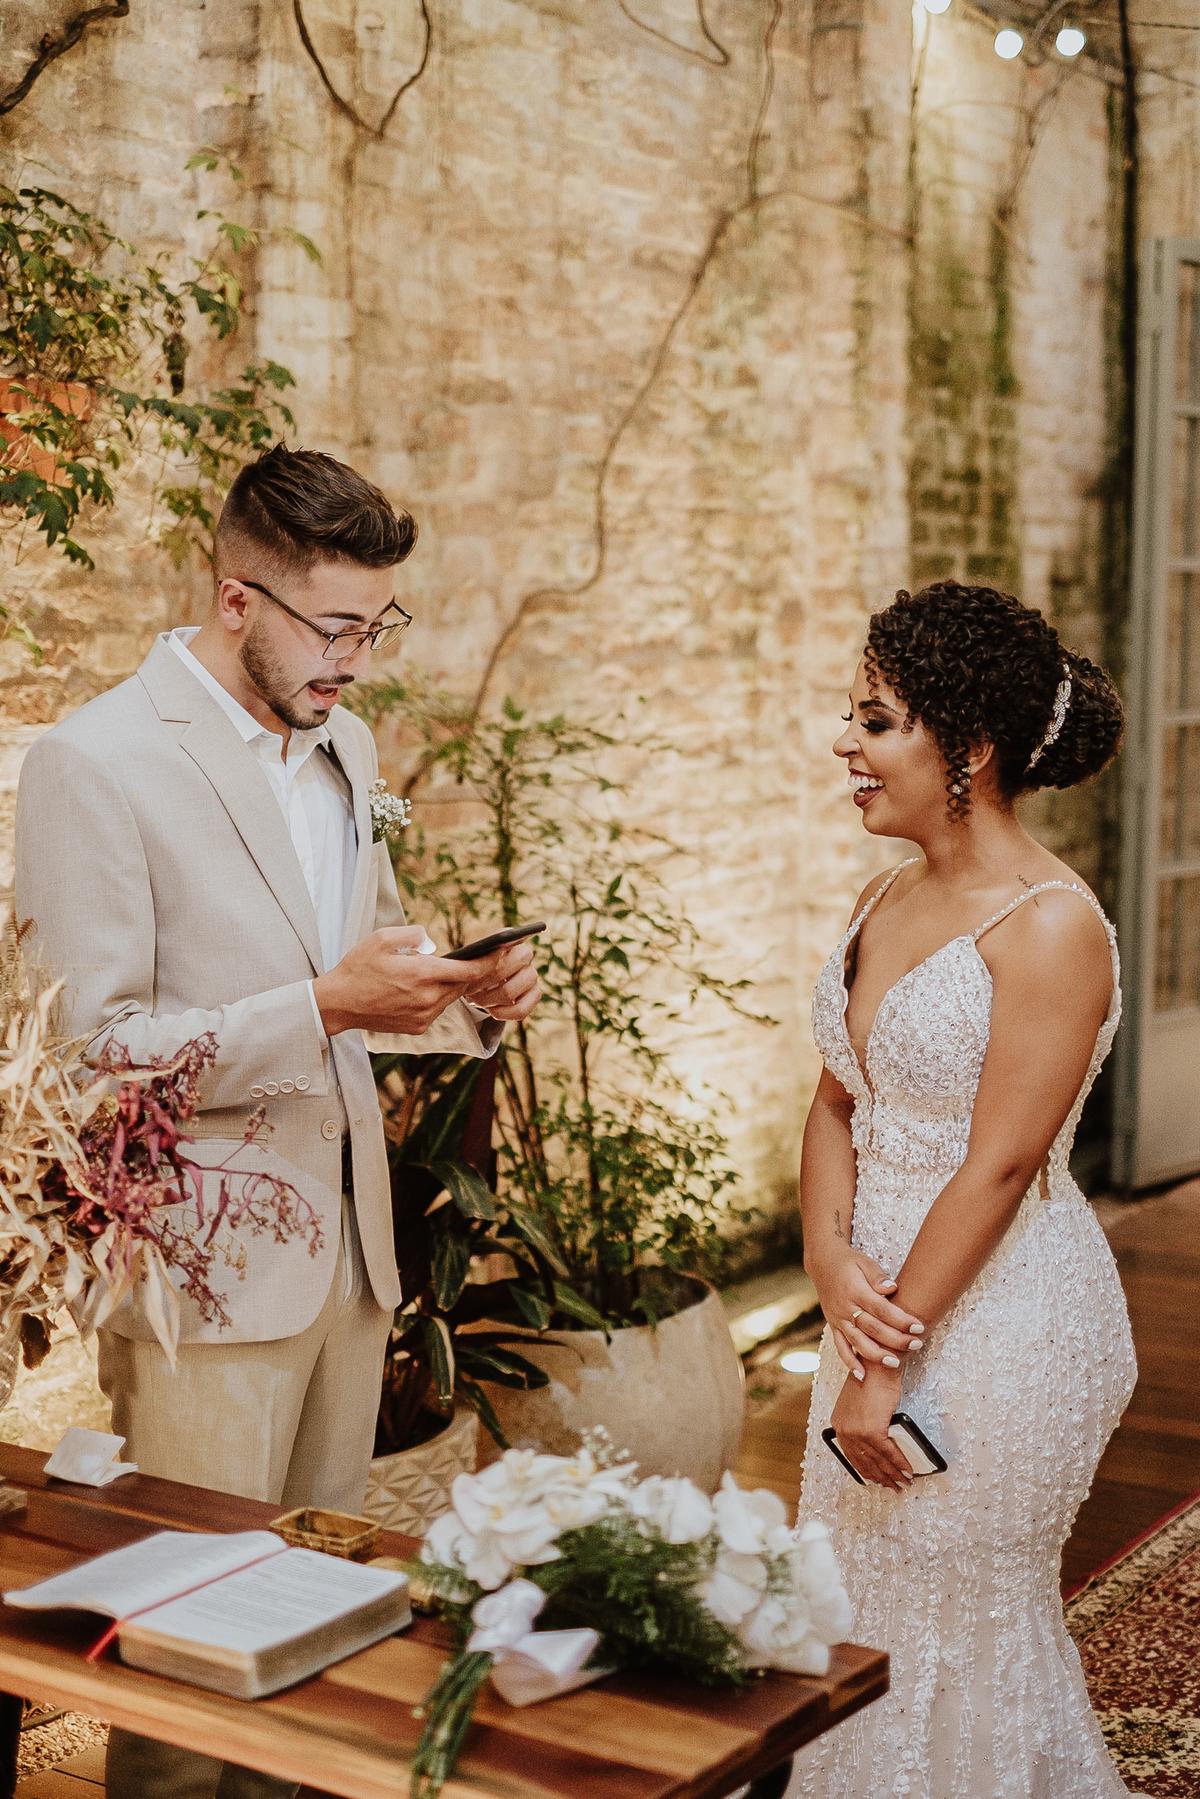 casamentos intimistas elopement wedding noivos no altar ideias para casar decoracao de casamento cerimonias intimistas votos dos noivos